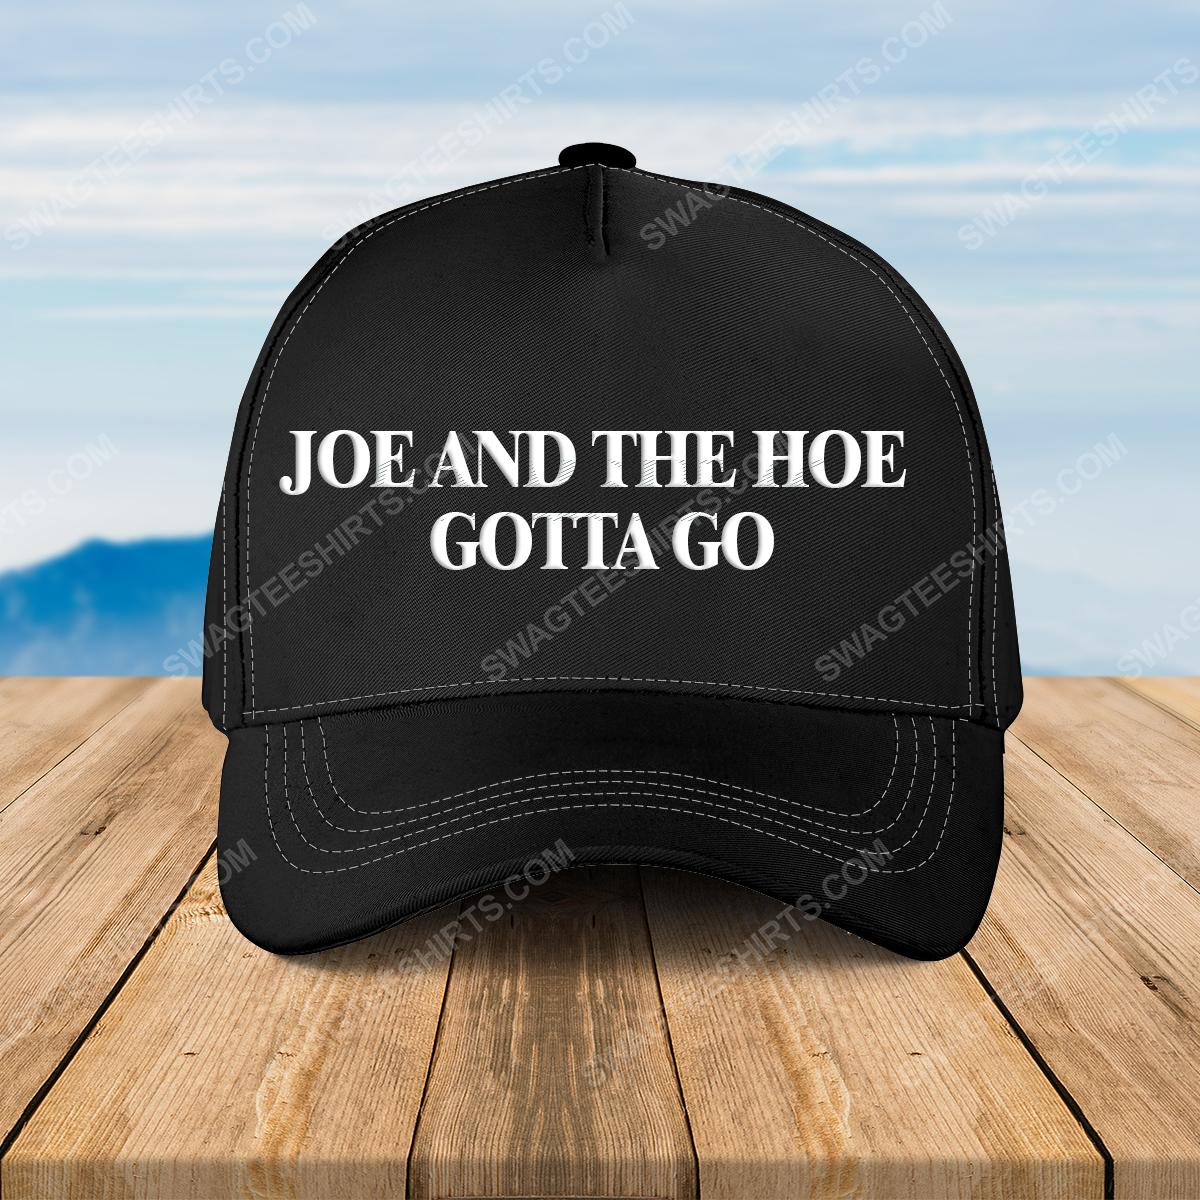 Joe and the hoe gotta go full print classic hat